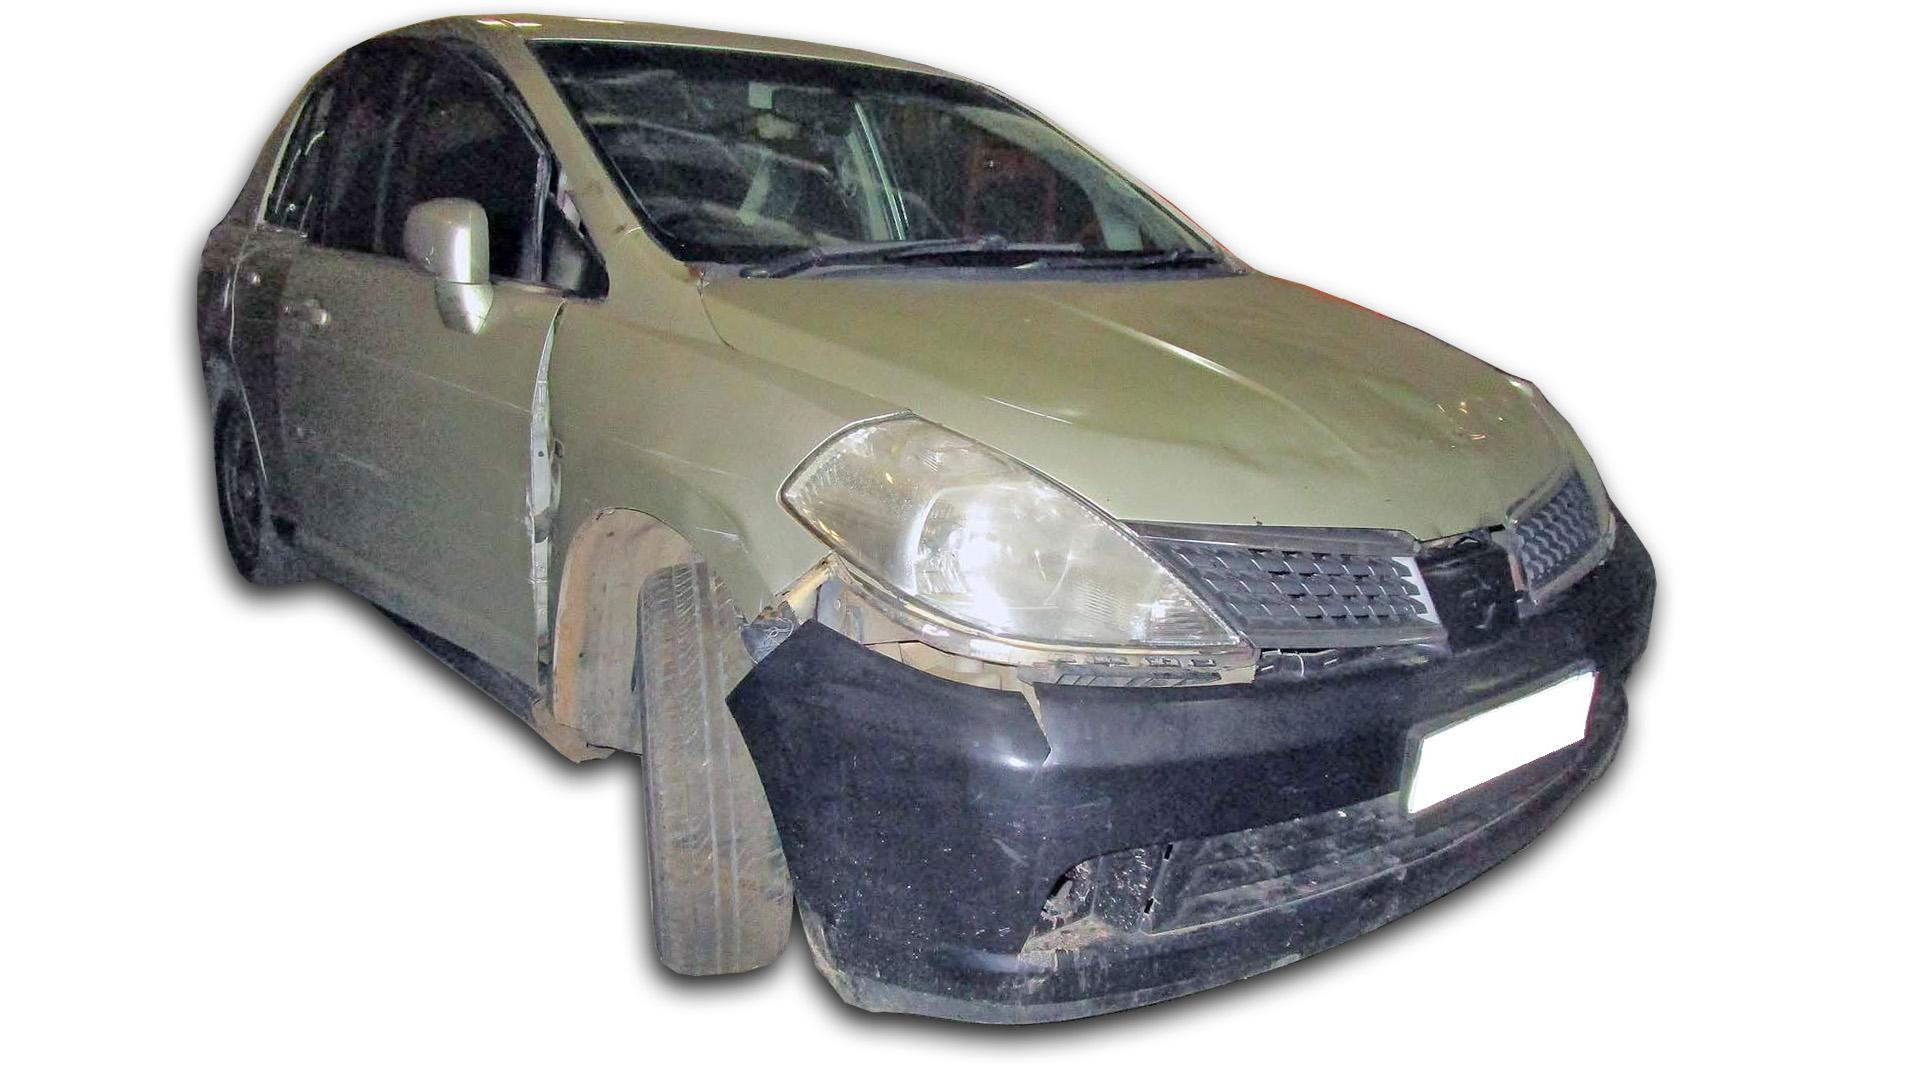 Nissan Tiida 1.6 Visia + (H